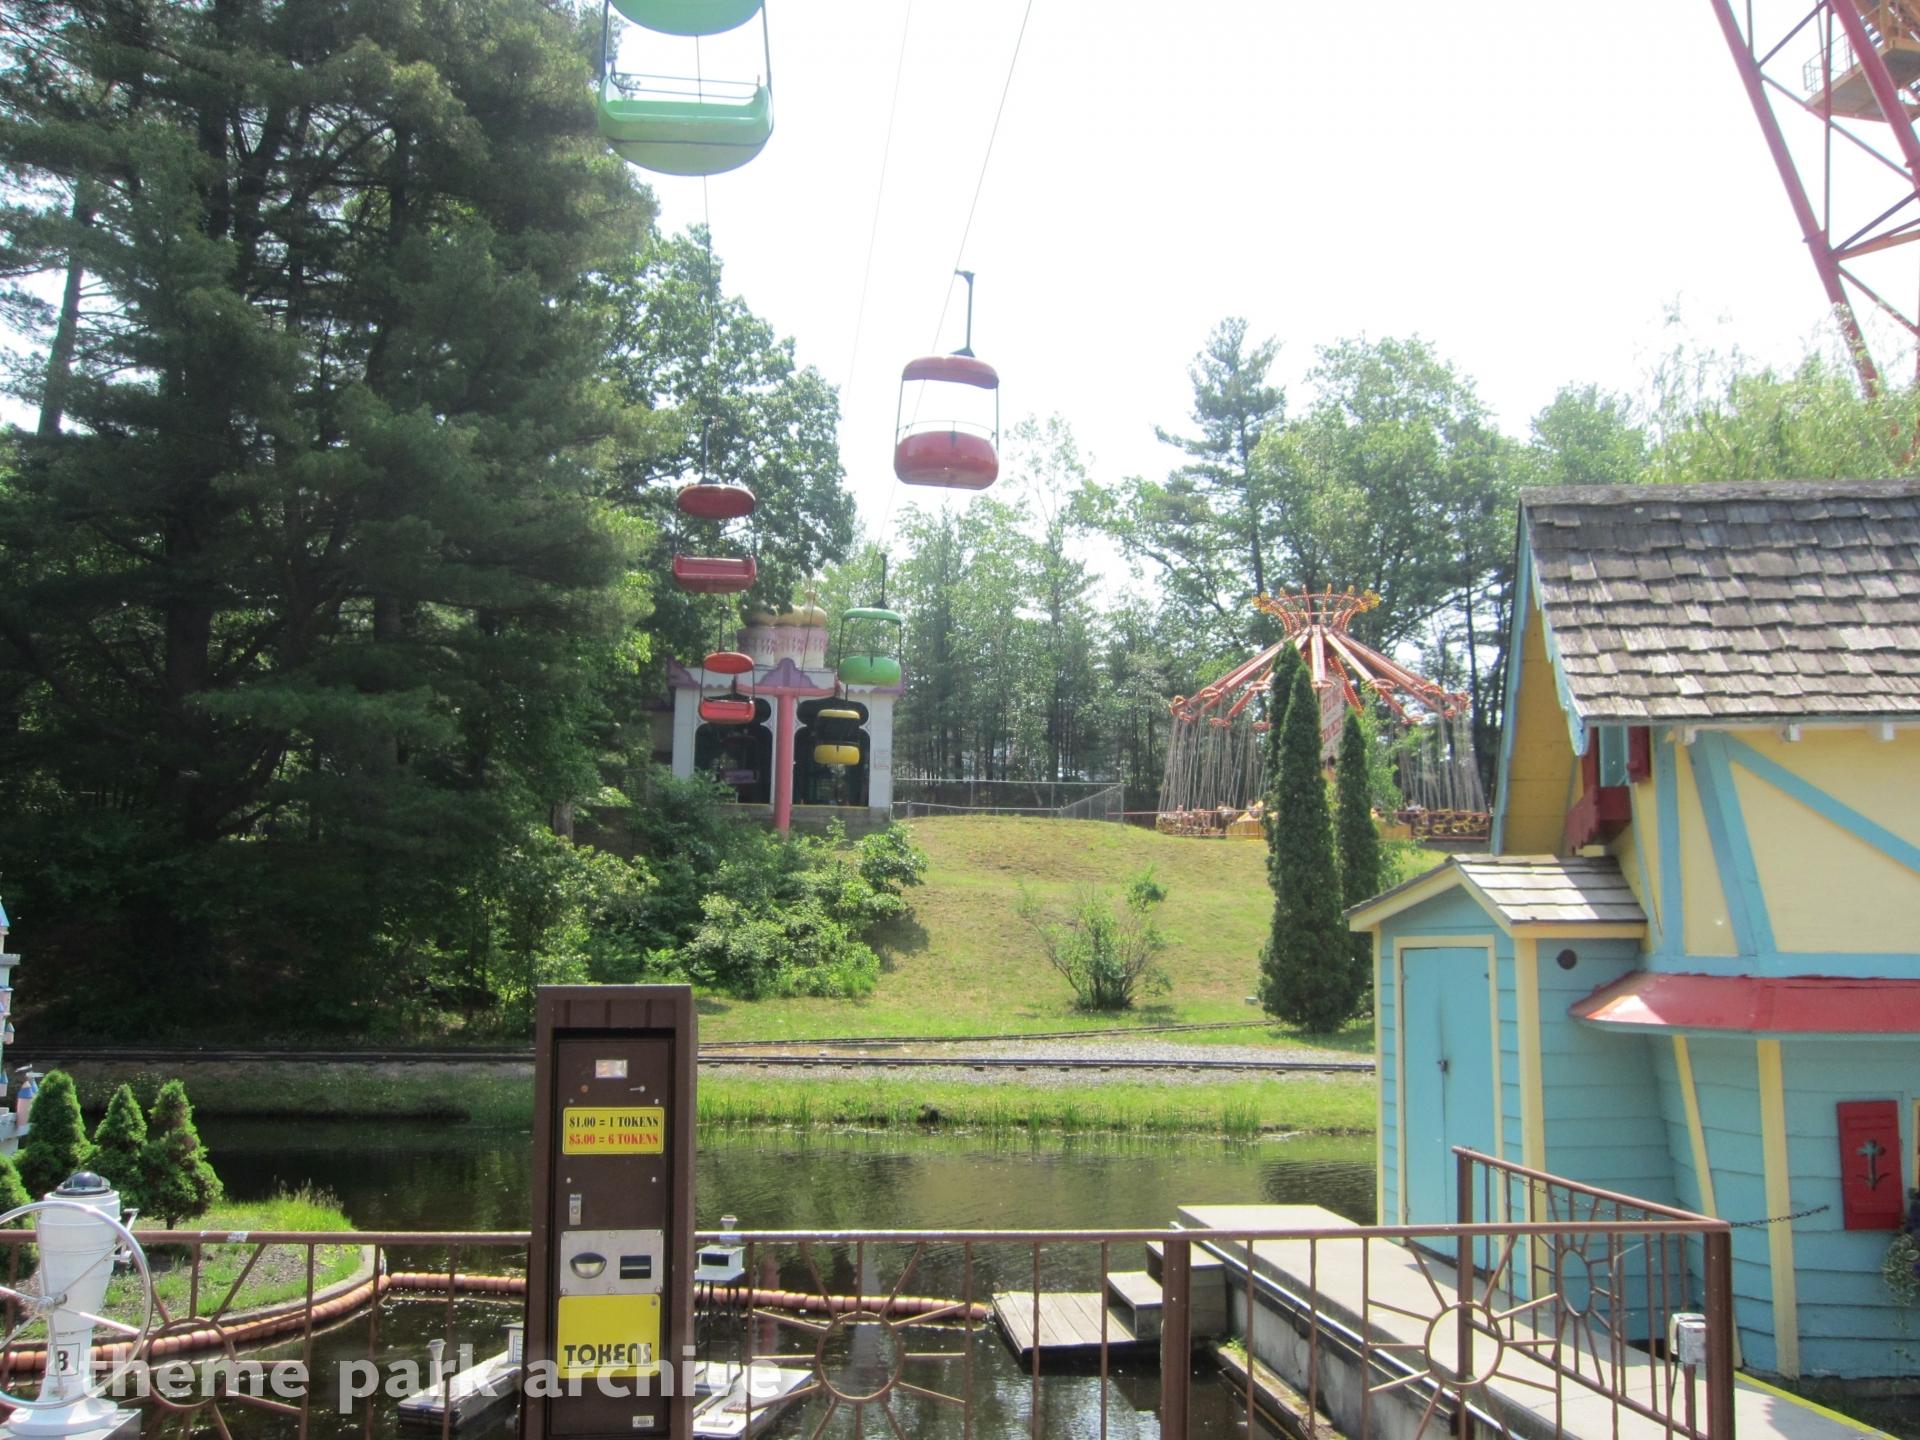 Sky Ride at Great Escape & Splashwater Kingdom